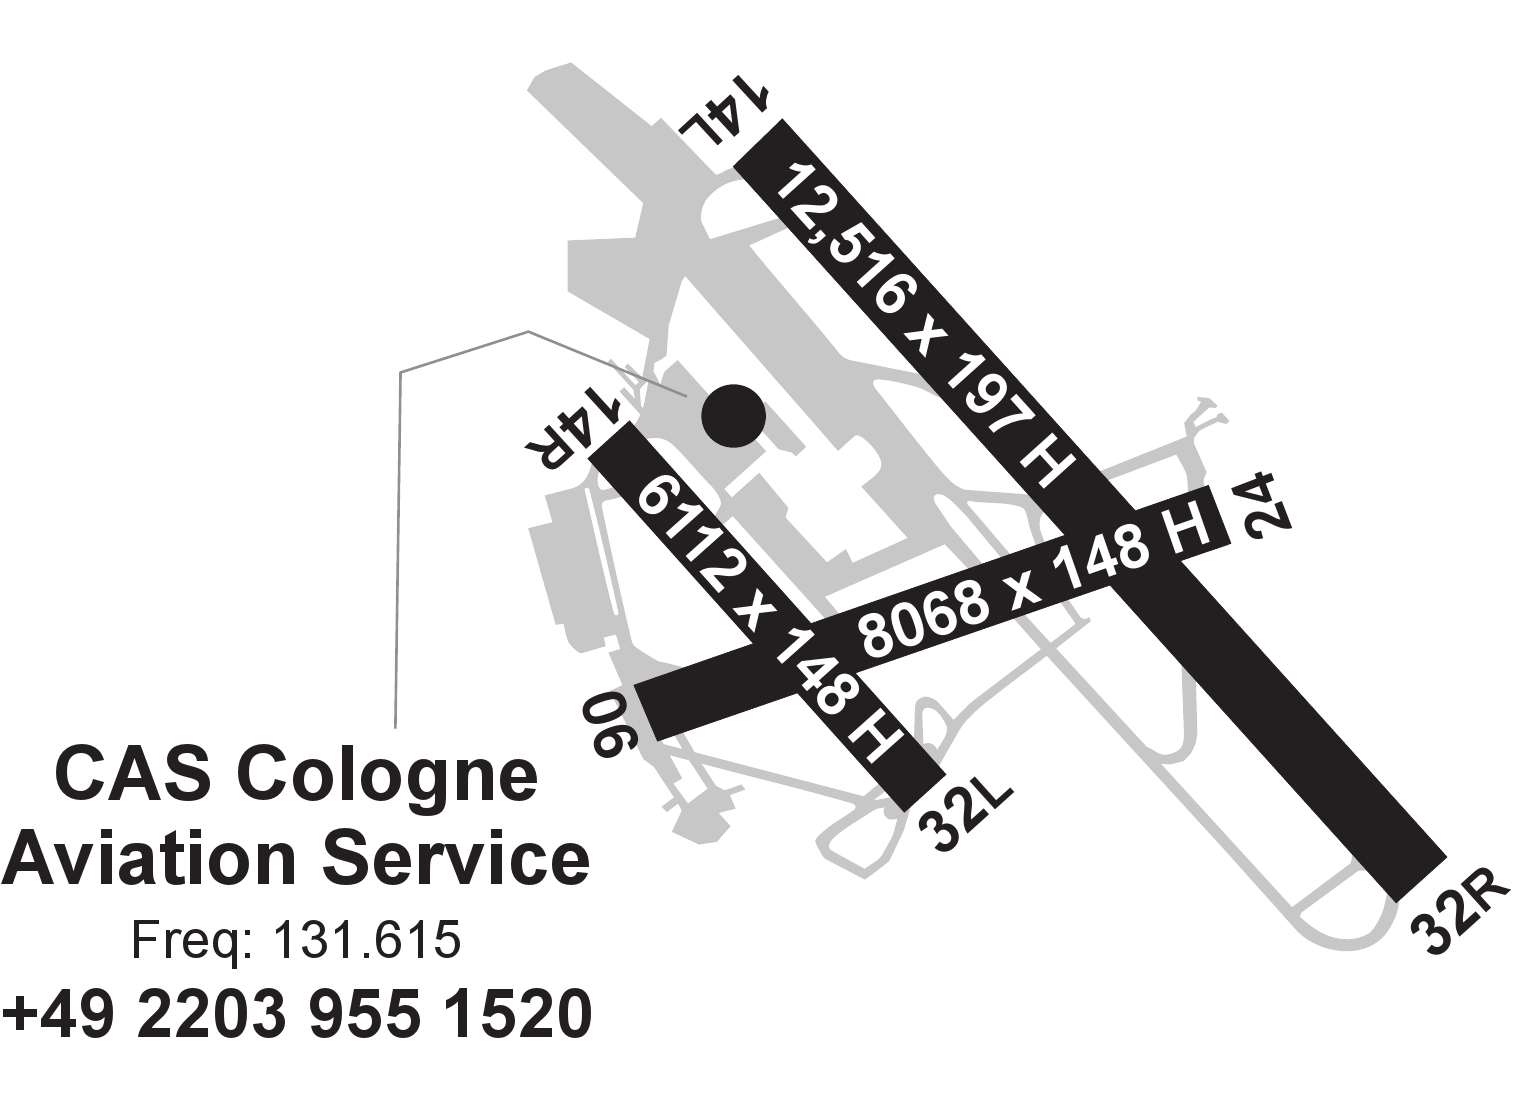 Cas Cologne Aviation Service